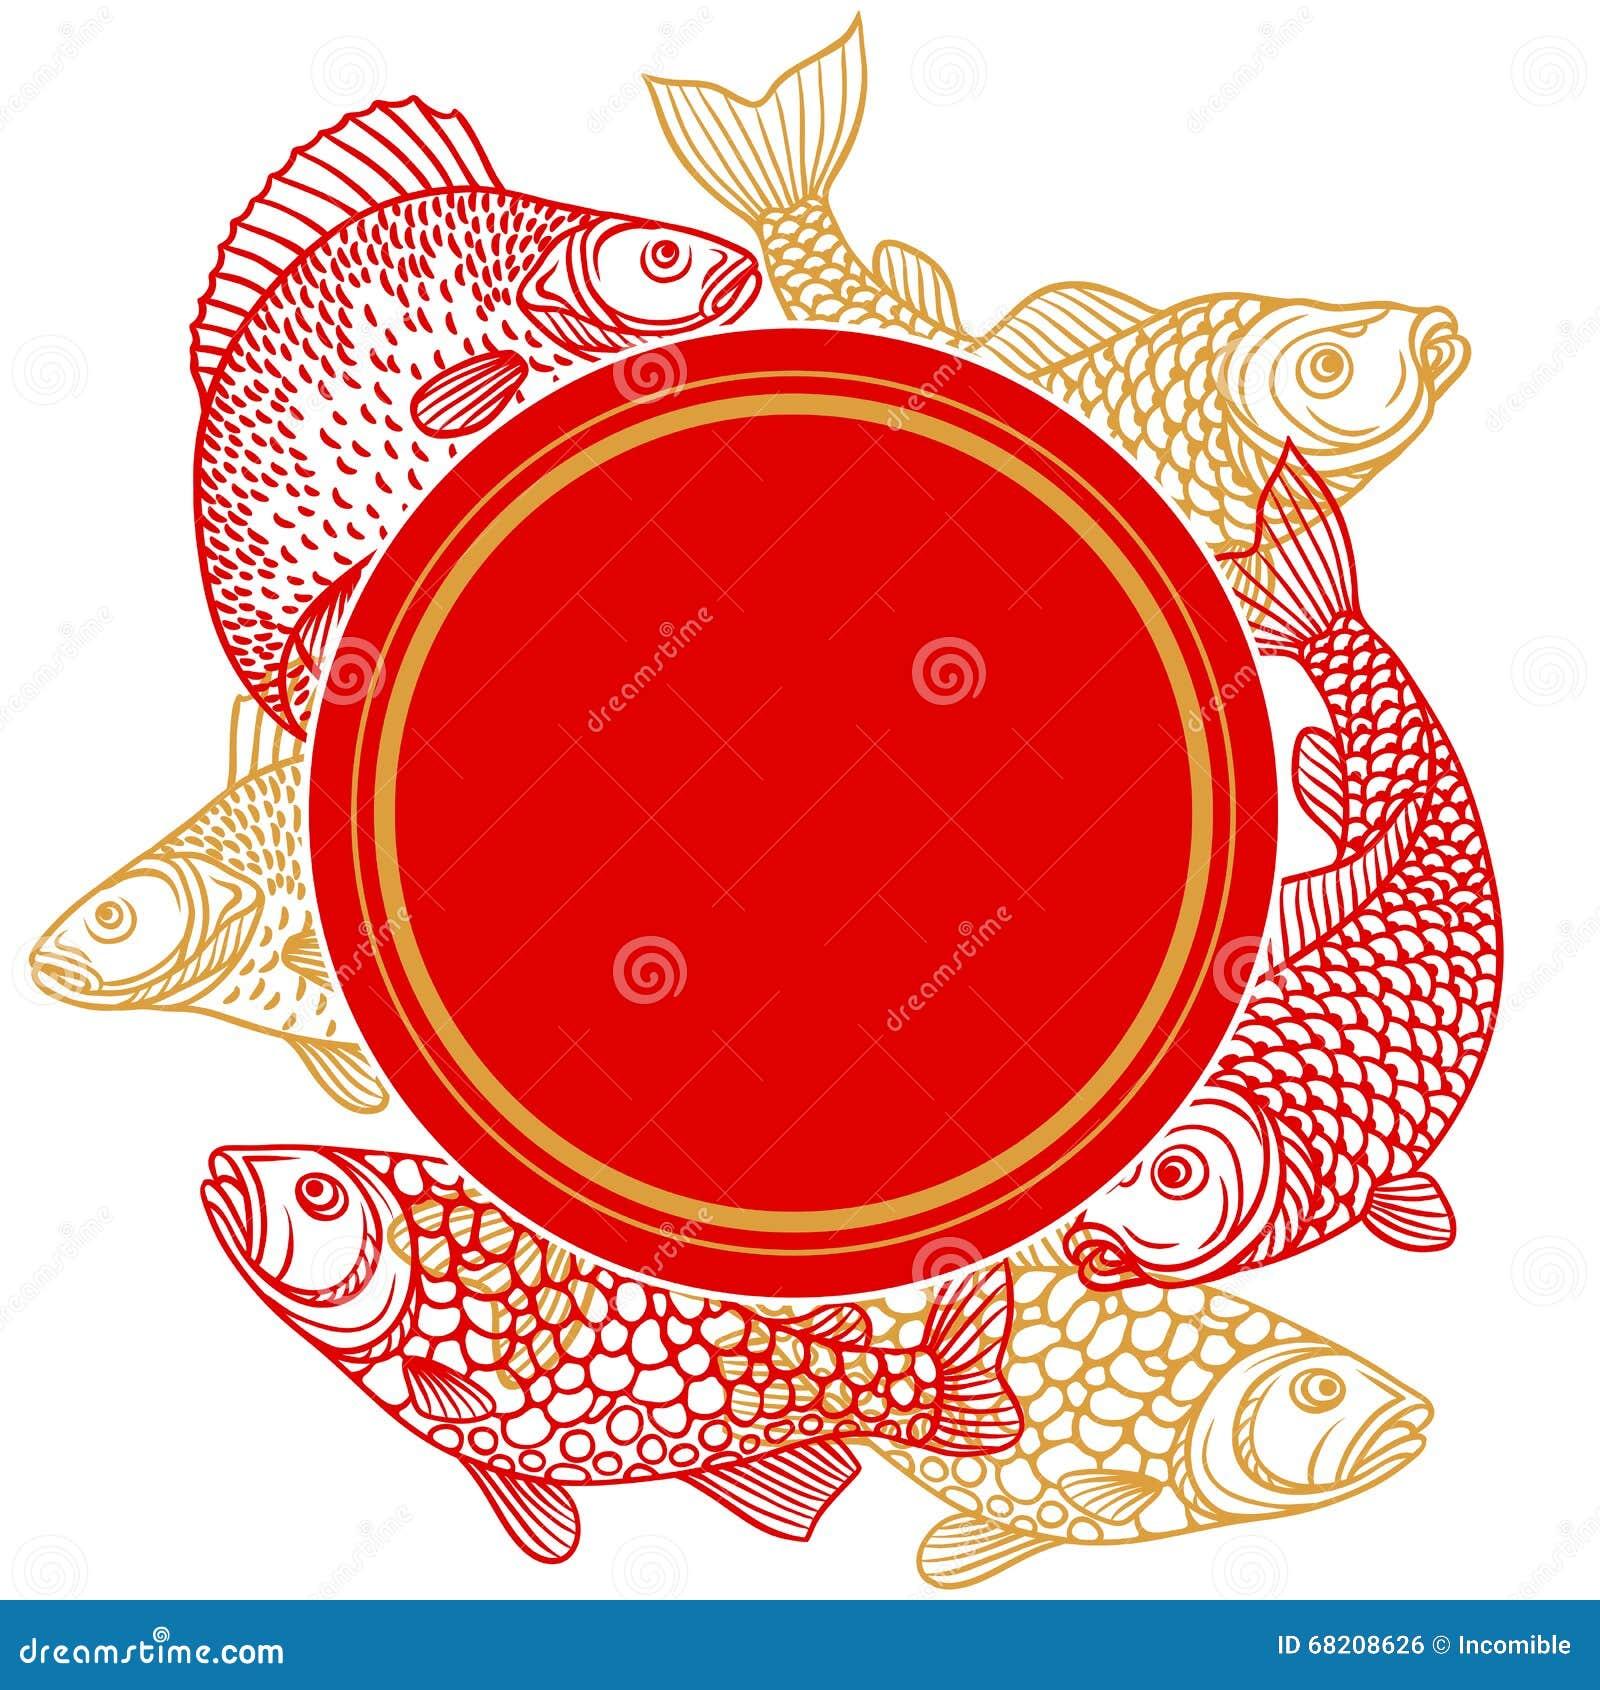 61bb4867d2bf Πλαίσιο κύκλων με τα διακοσμητικά ψάρια Εικόνα για το σχέδιο στις μπλούζες